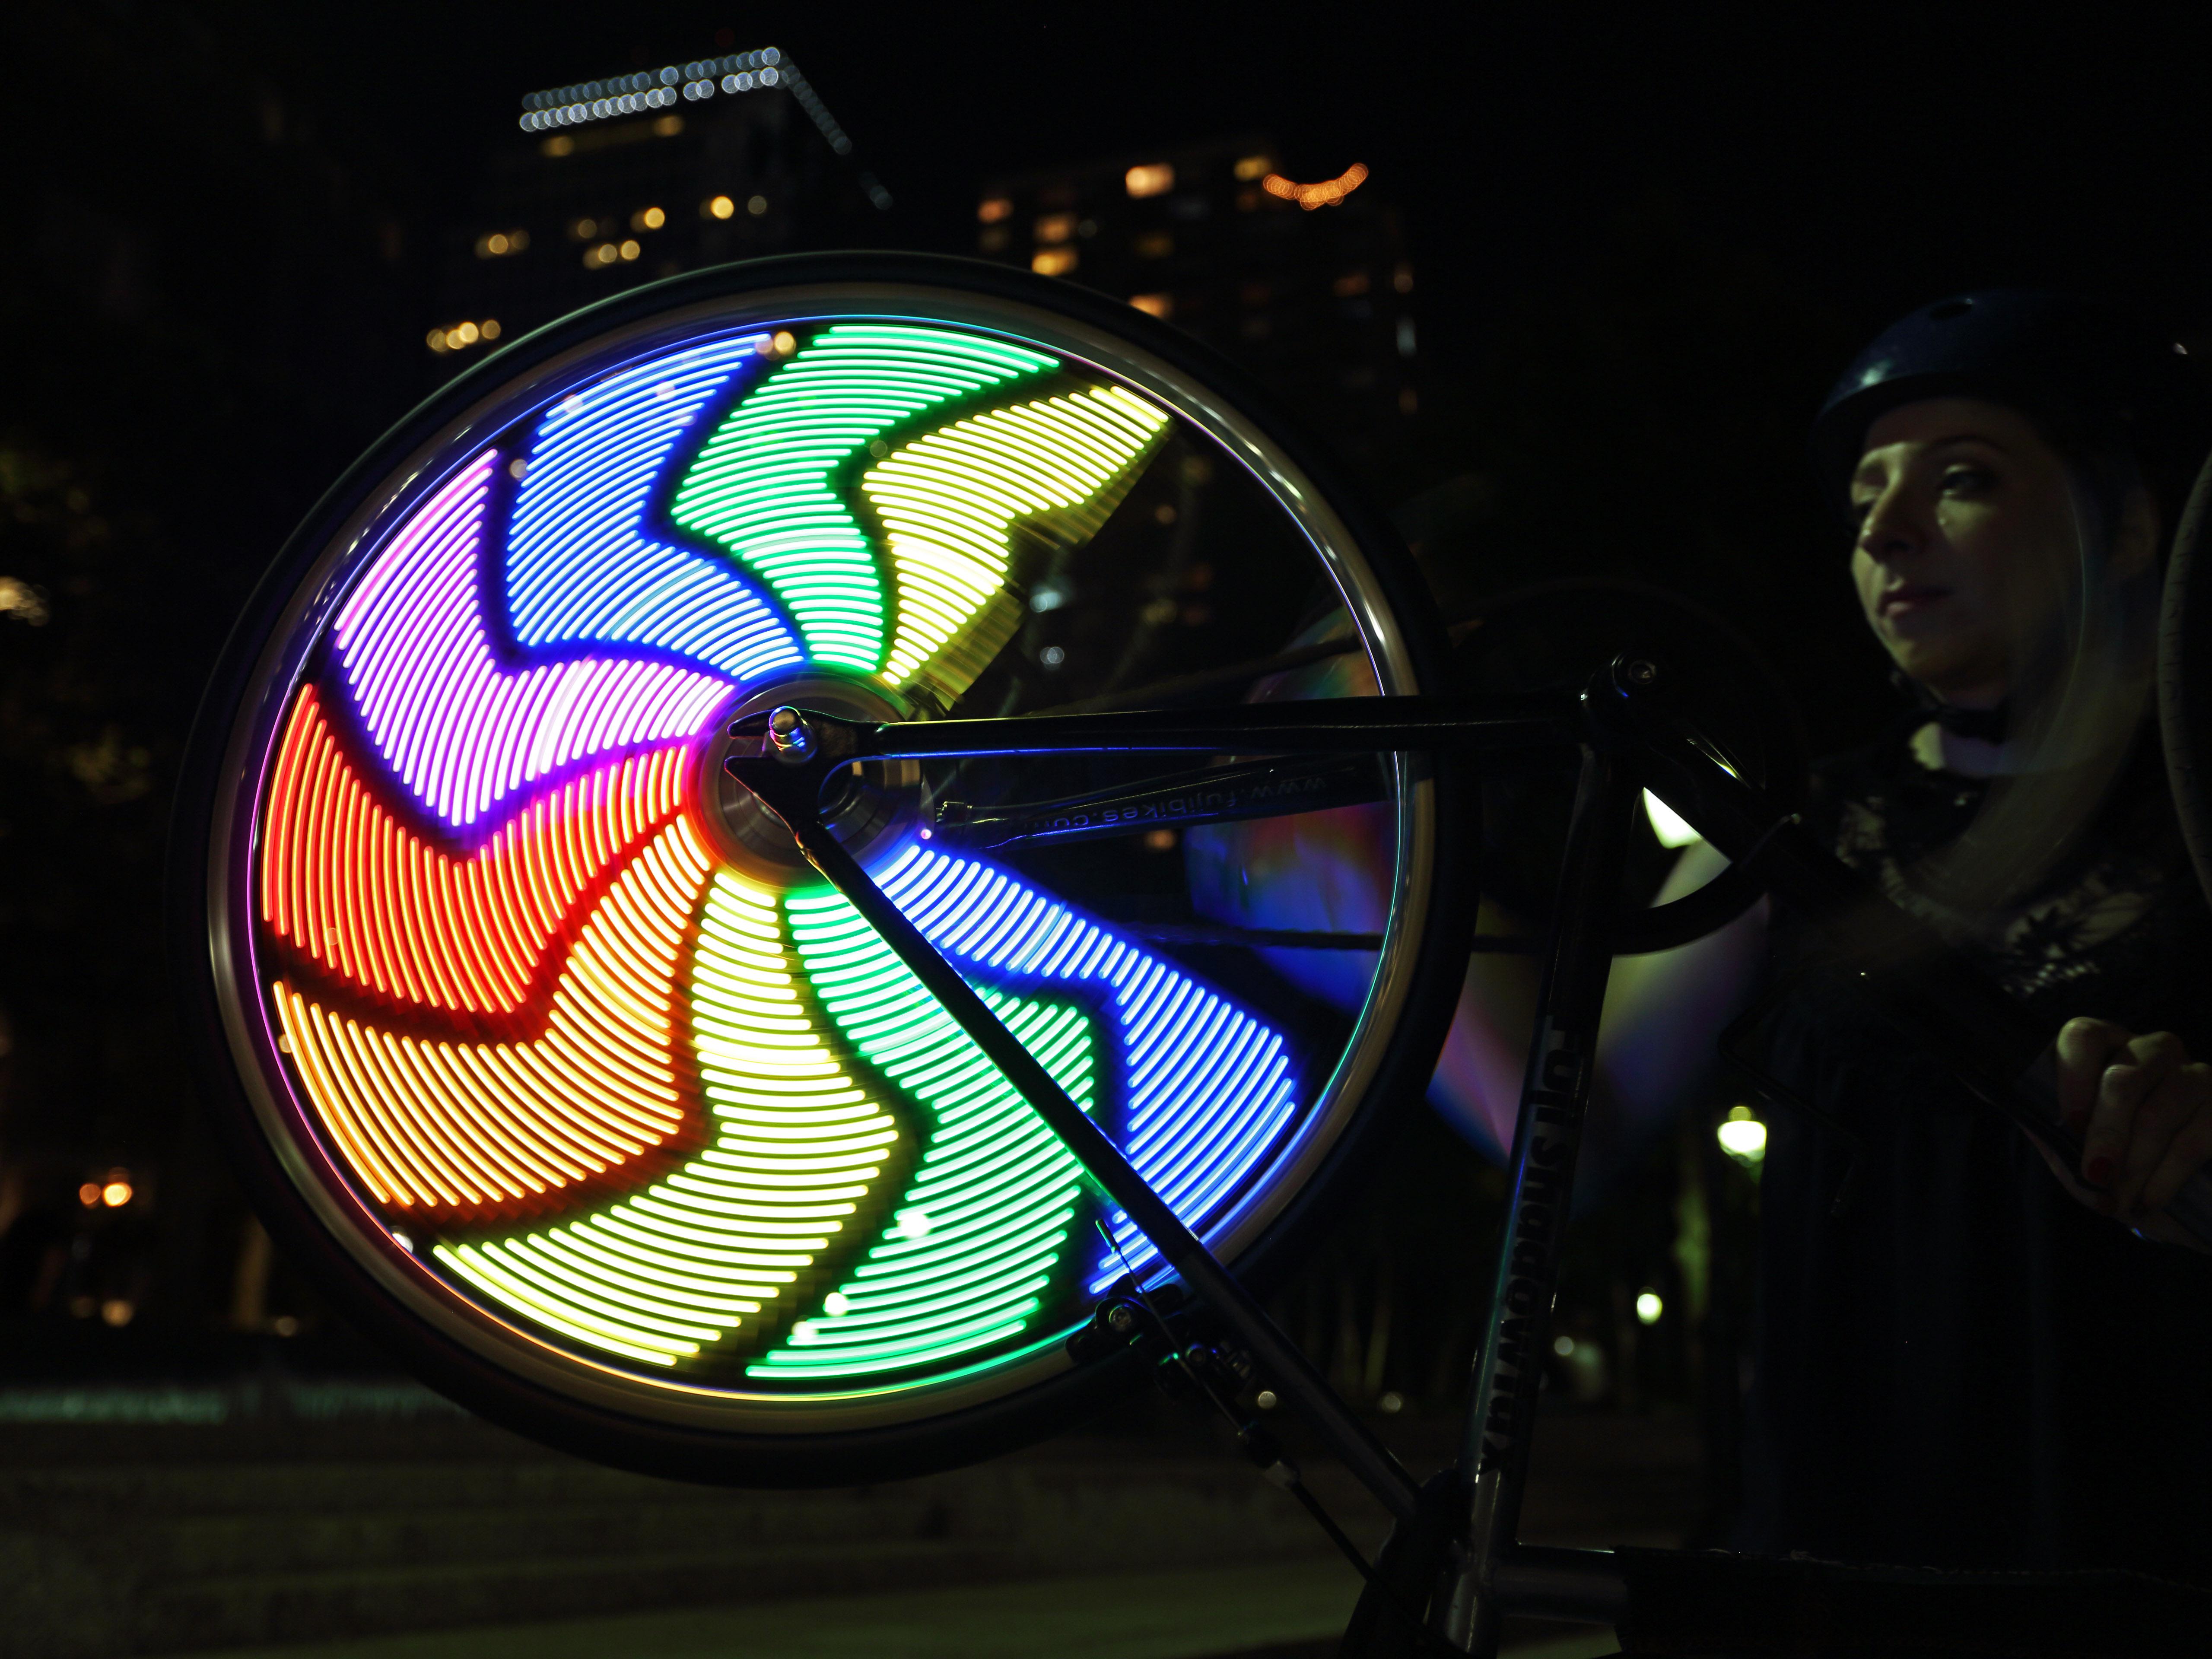 projects_Bike_Wheel_POV_Display_adafruit_02.jpg